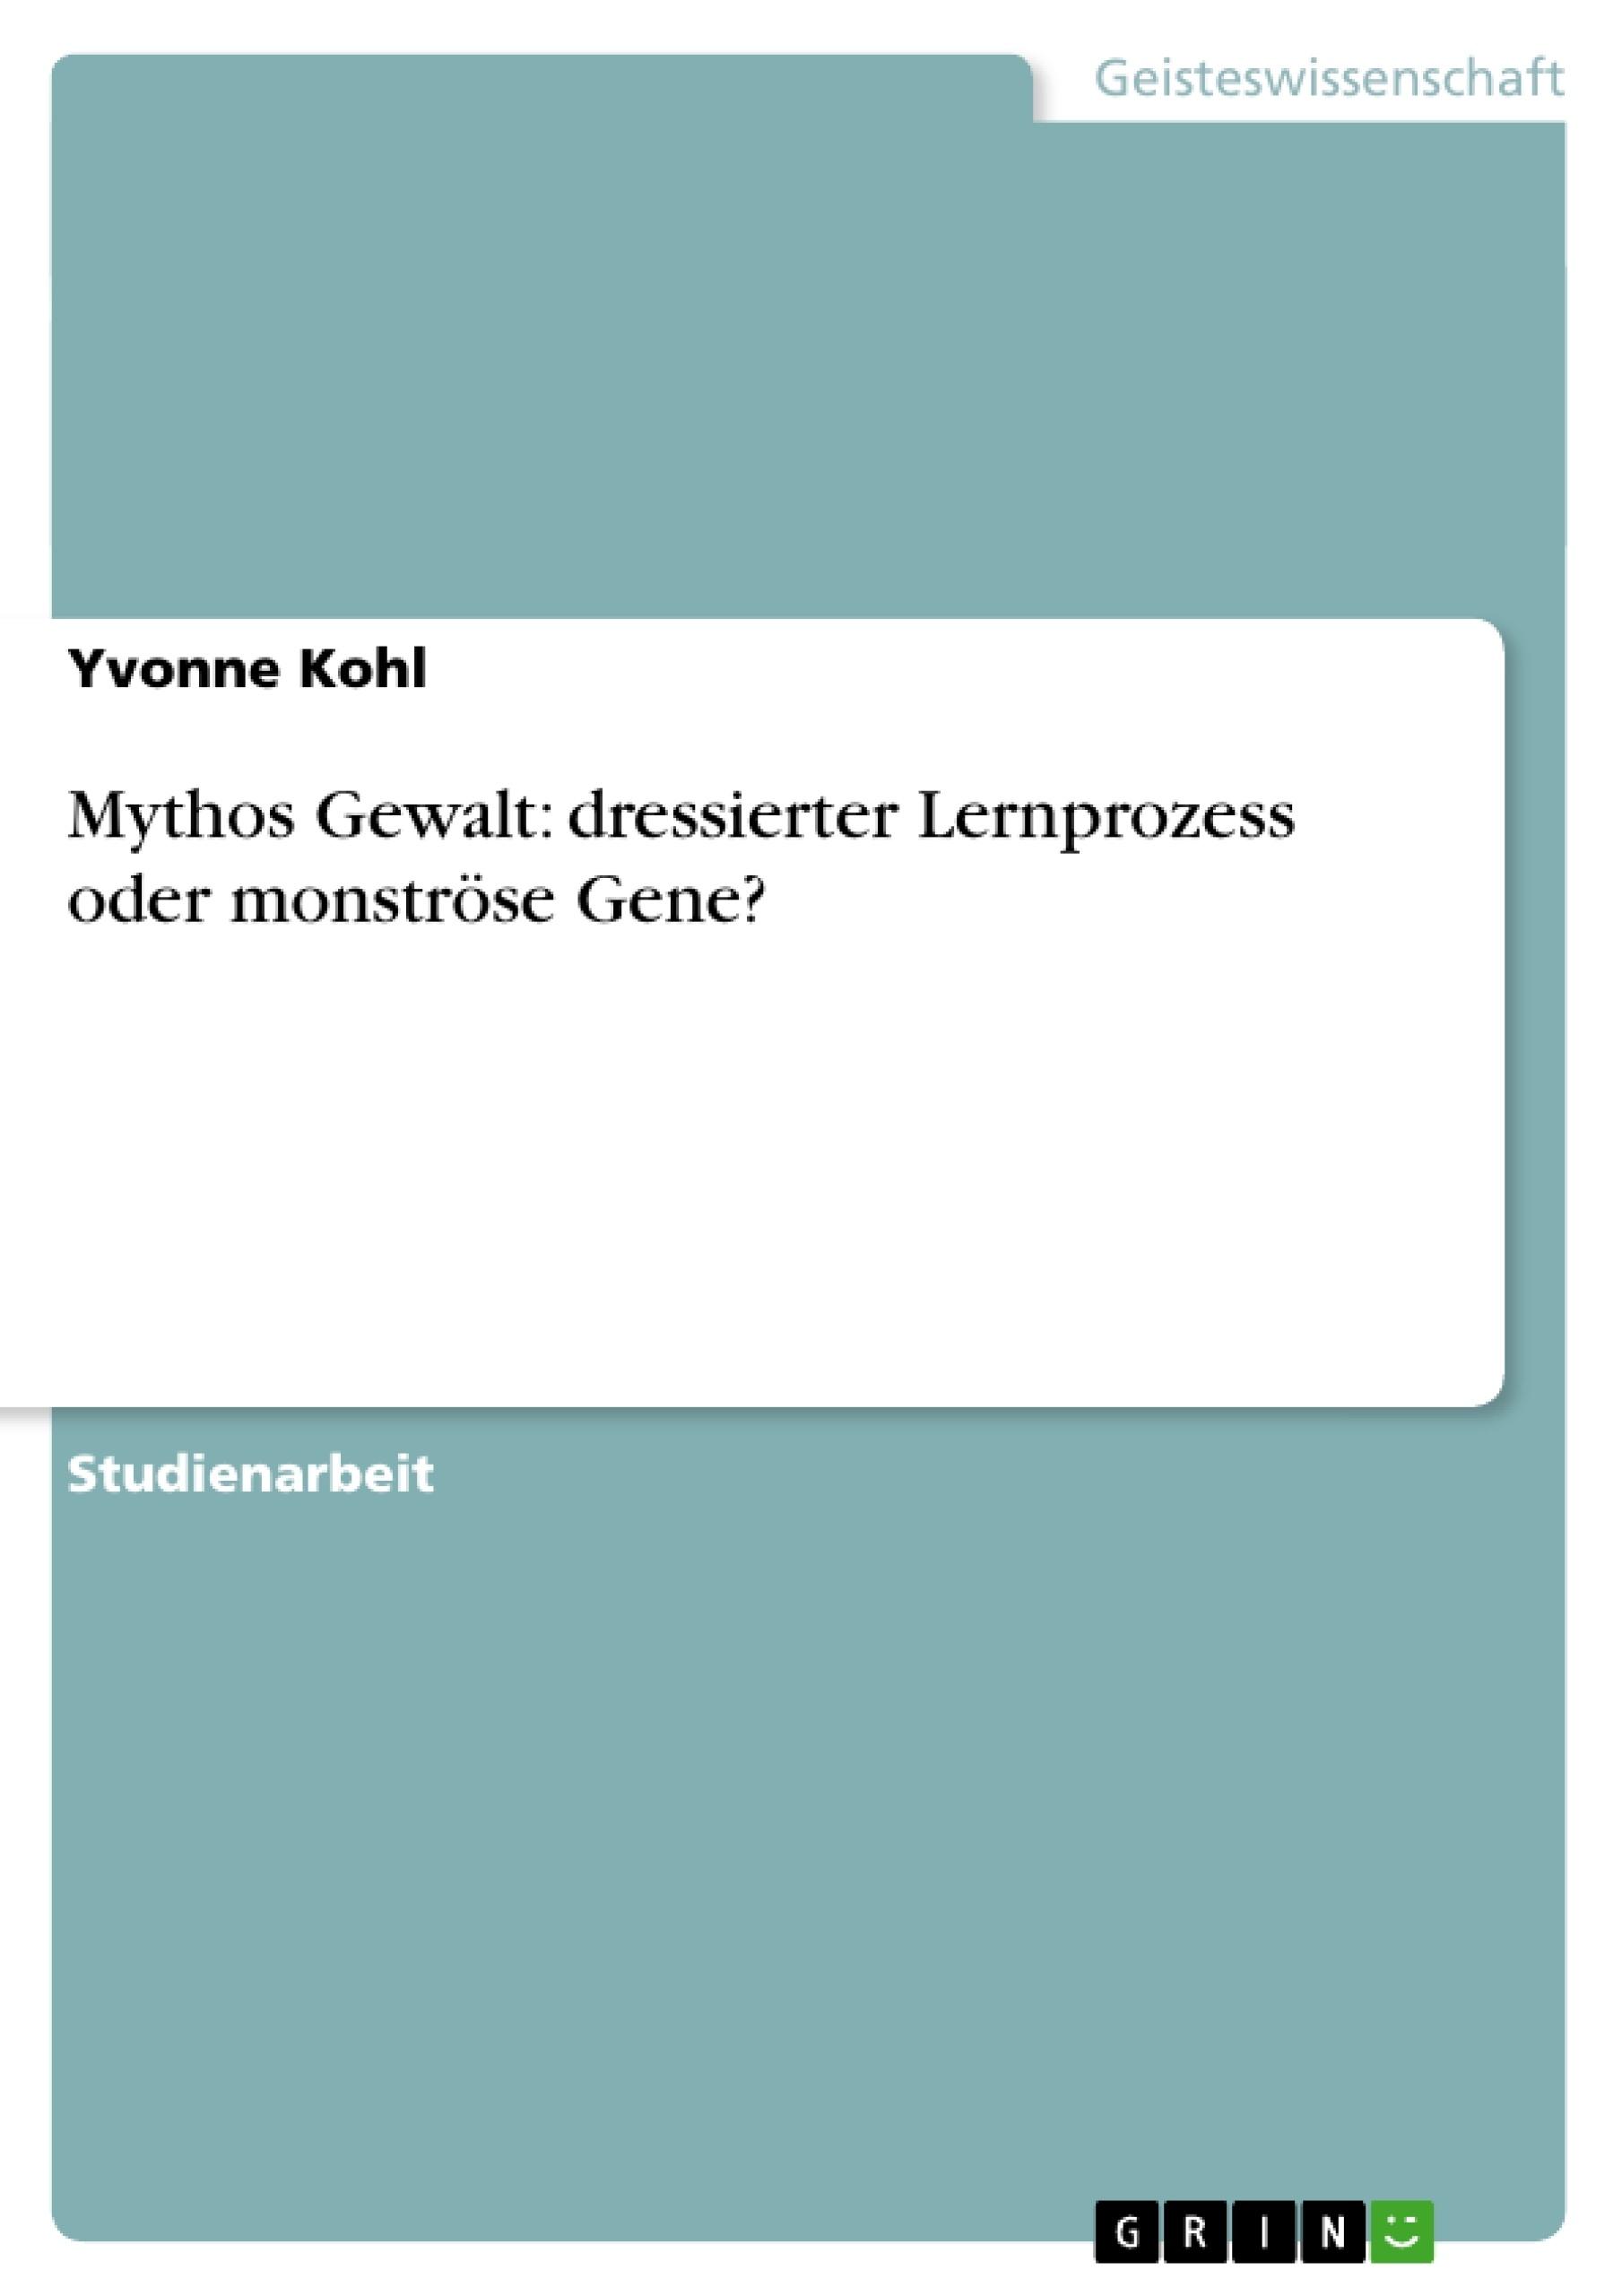 Titel: Mythos Gewalt: dressierter Lernprozess oder monströse Gene?